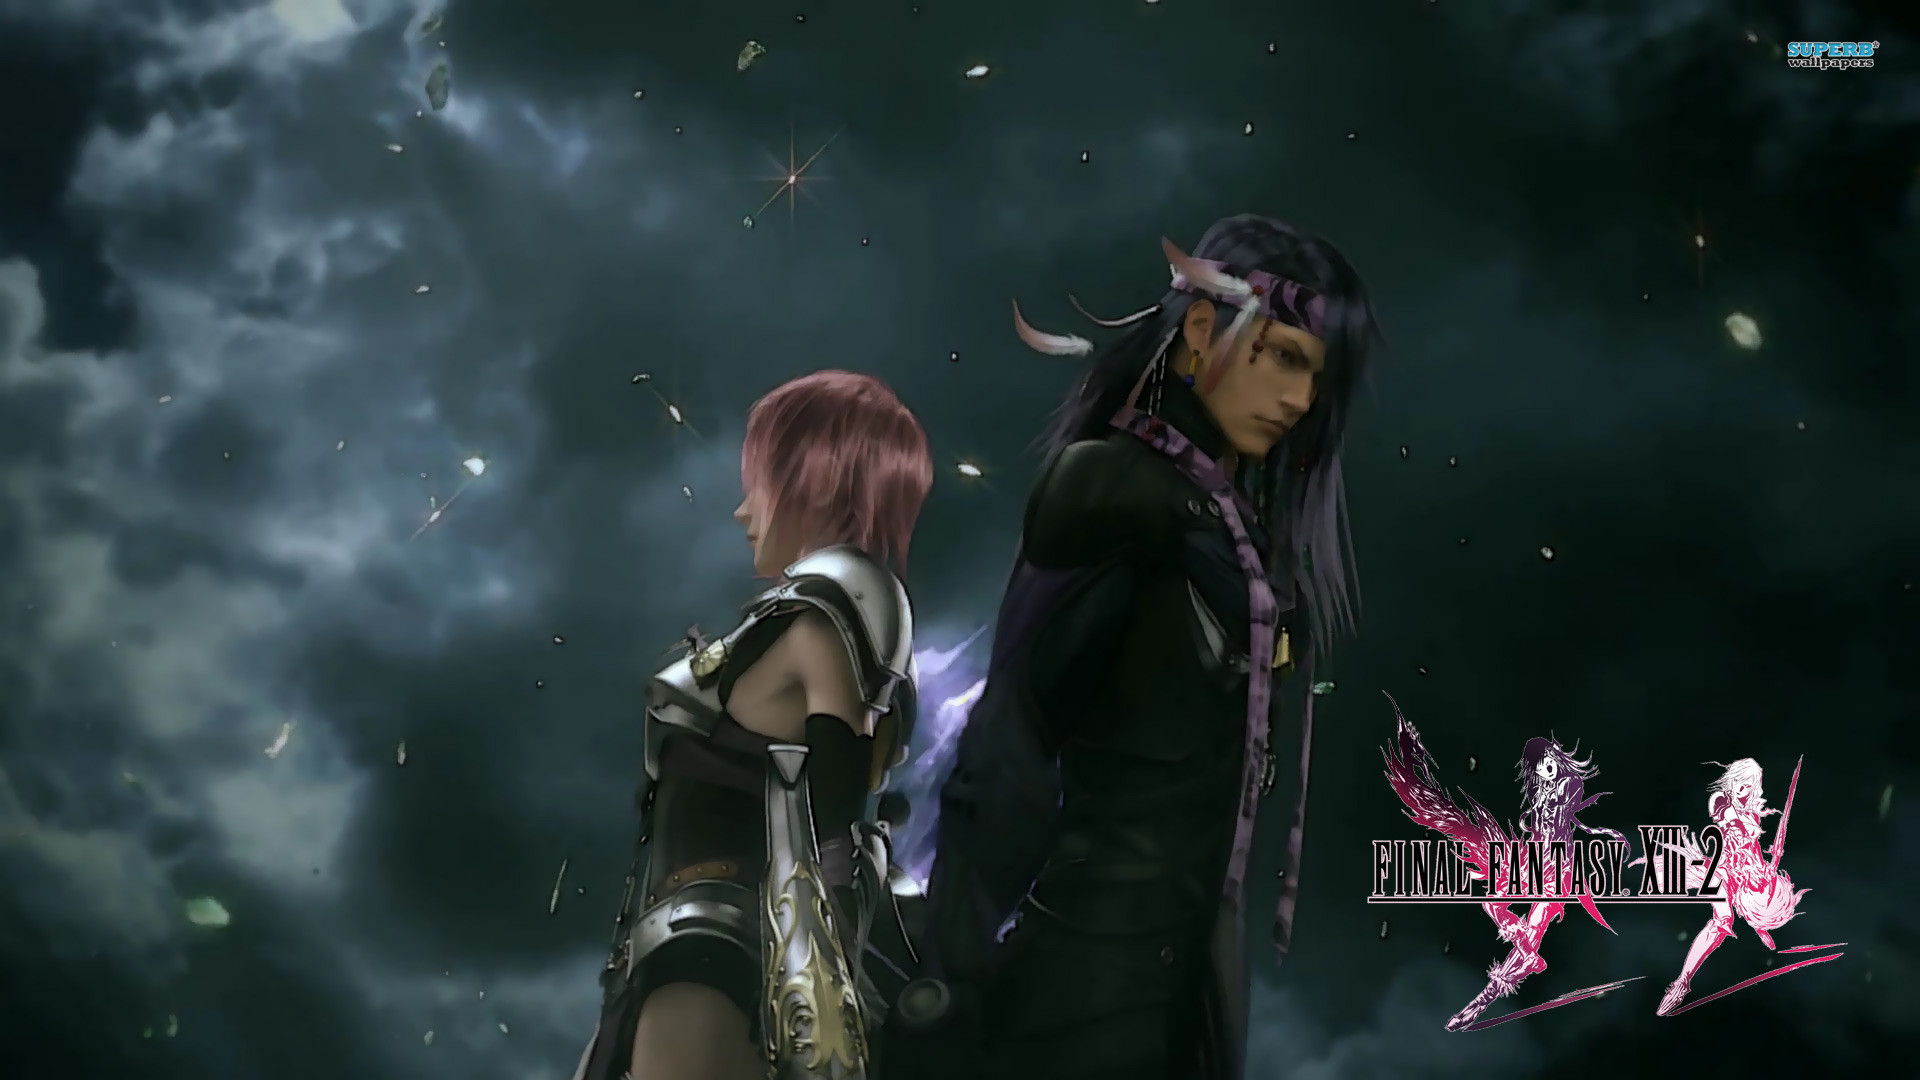 Lightning and Caius – Final Fantasy wallpaper